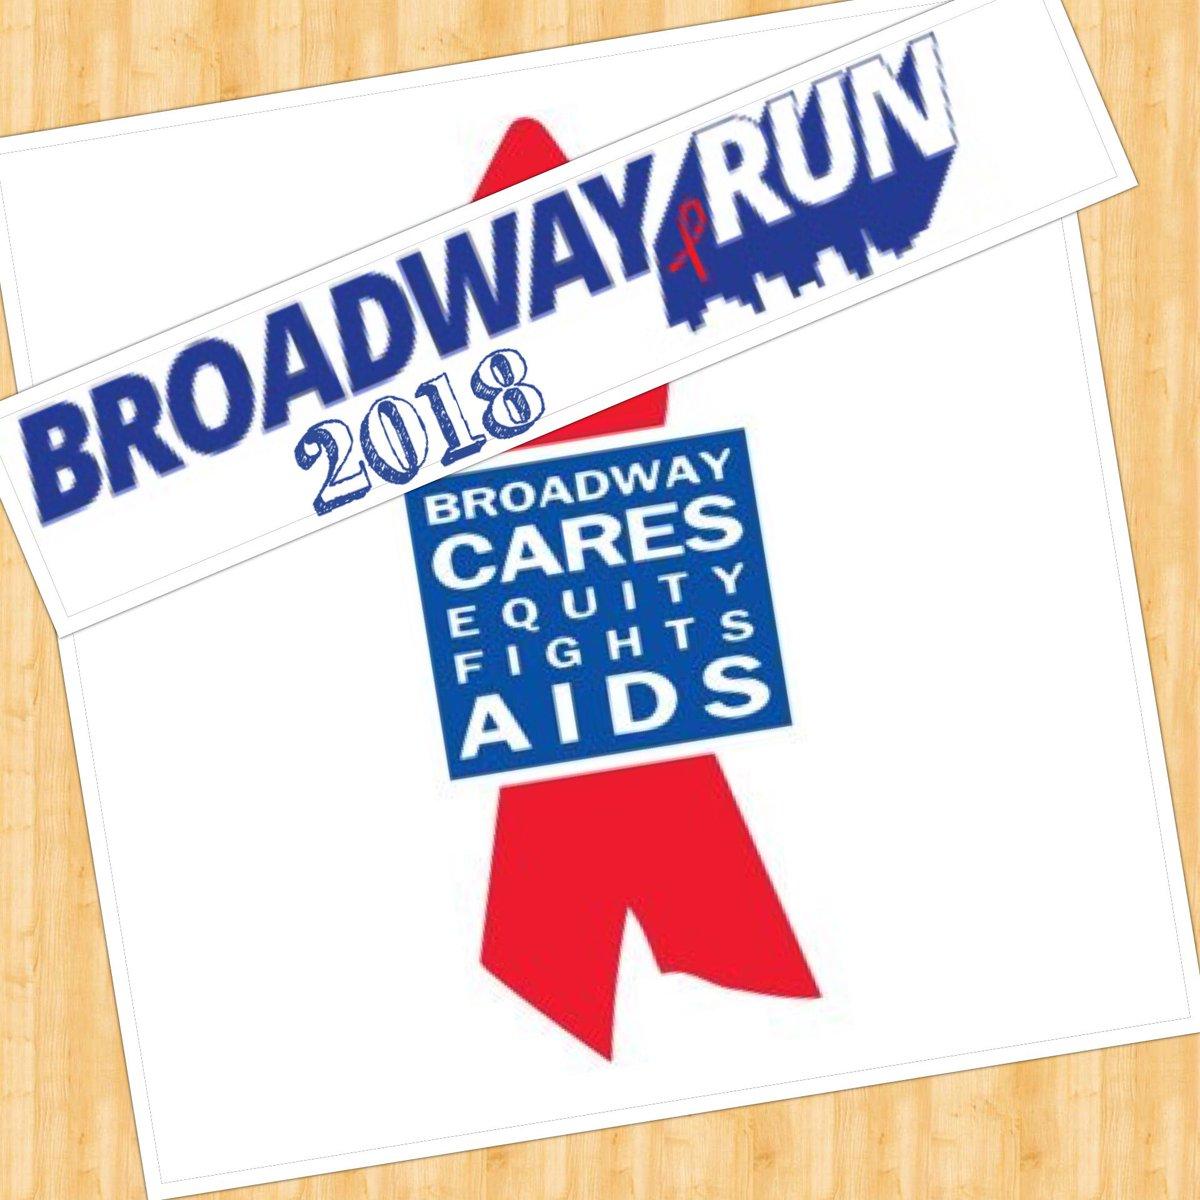 453eb7234cf4 #broadway #5k @bcefa #nyc #charity #centralpark @BroadwayKidsJam  https://donate.broadwaycares.org/team/193608 pic.twitter.com/rskYz8JZ2P